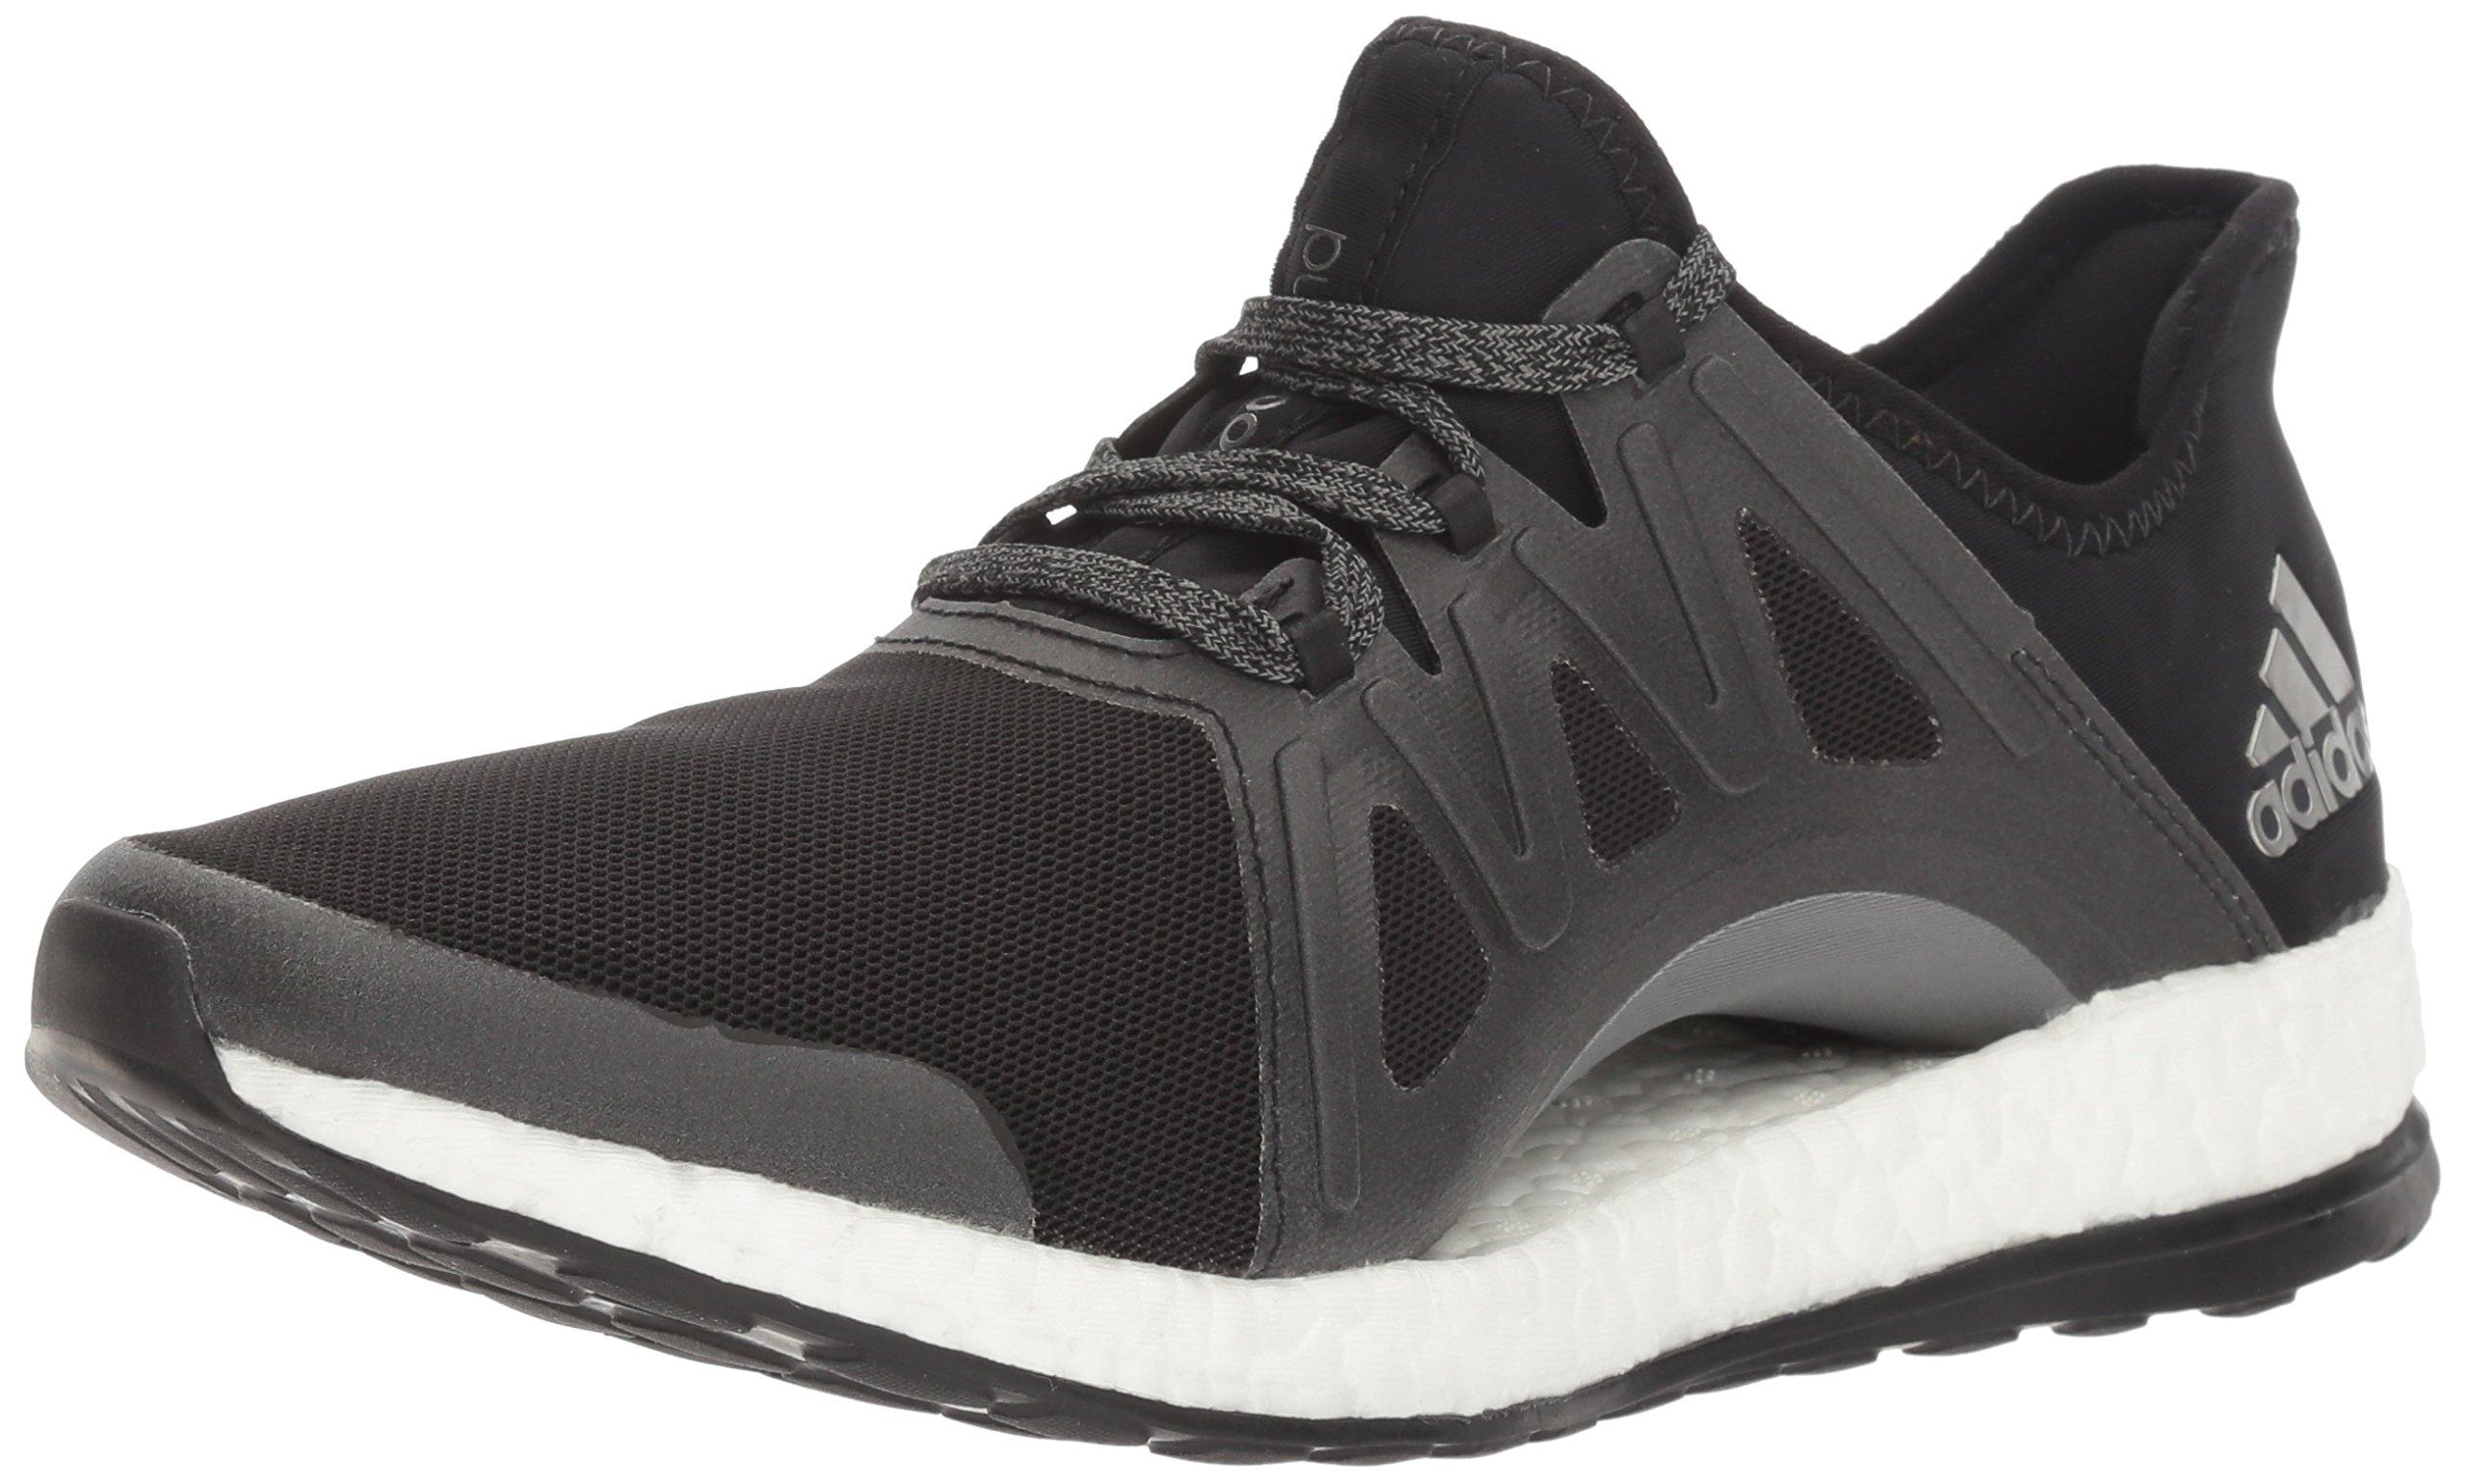 c44d1baab Galleon - Adidas Women s Pureboost Xpose Running Shoe